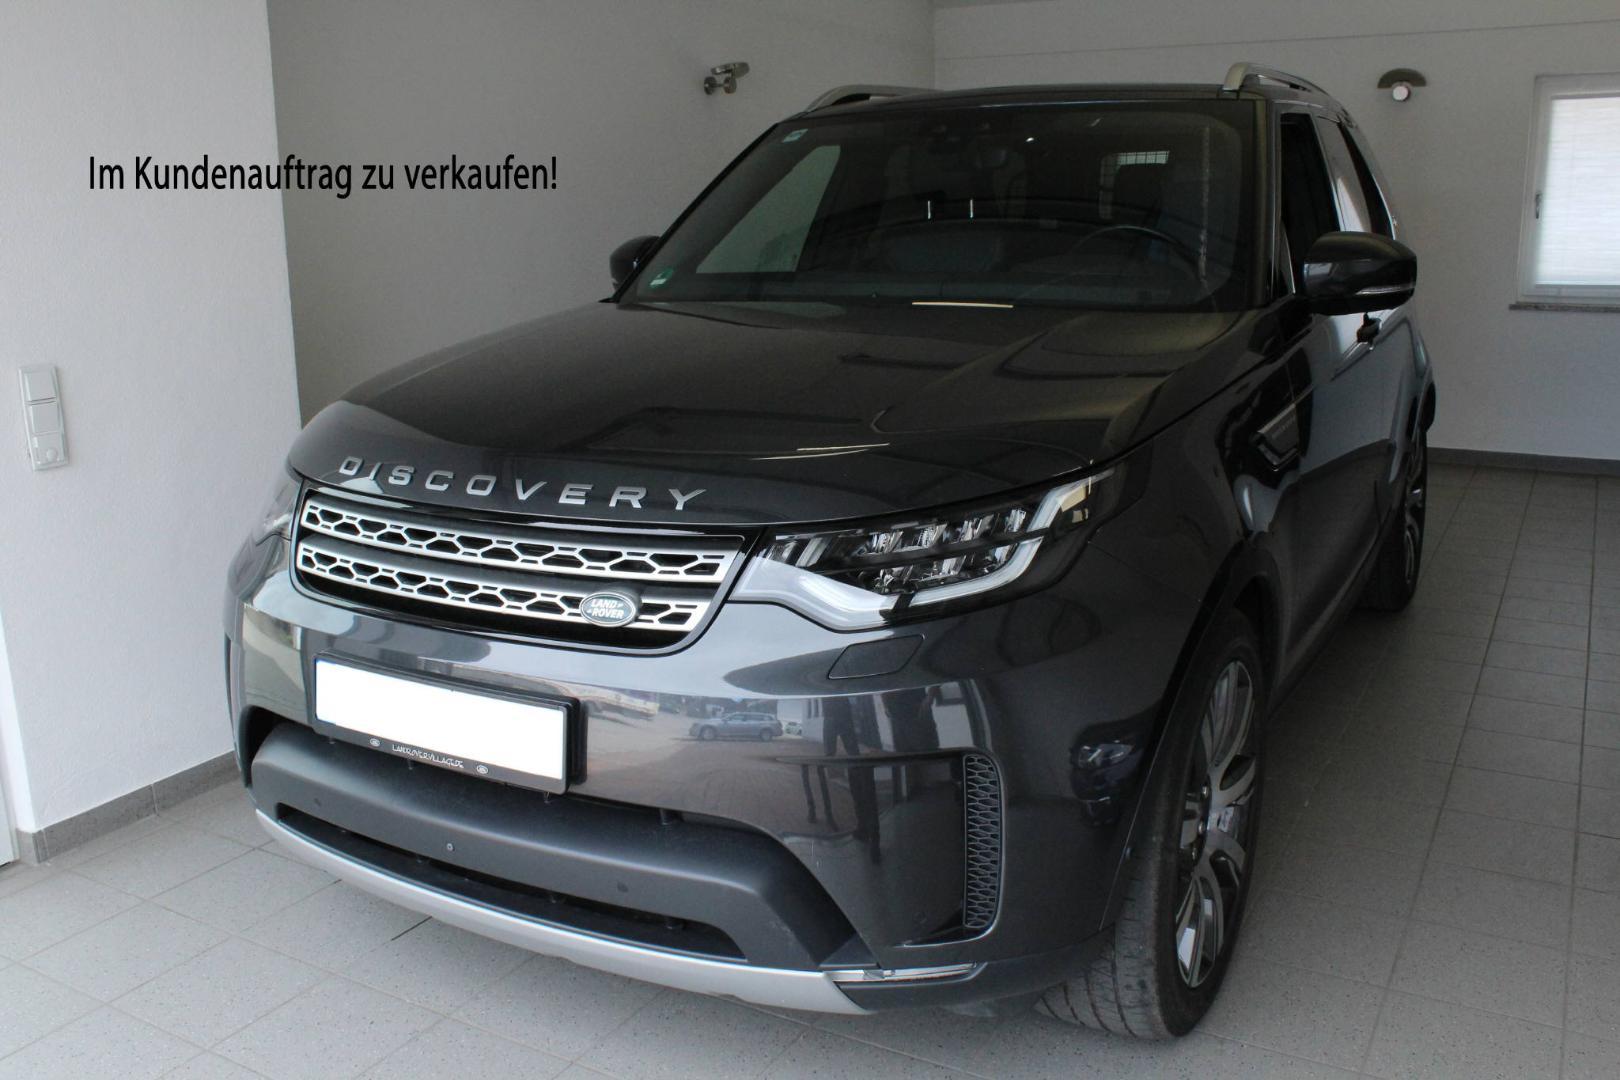 Land Rover Discovery 5 3.0 TD6 Navi LED ACC AHK, Jahr 2017, Diesel